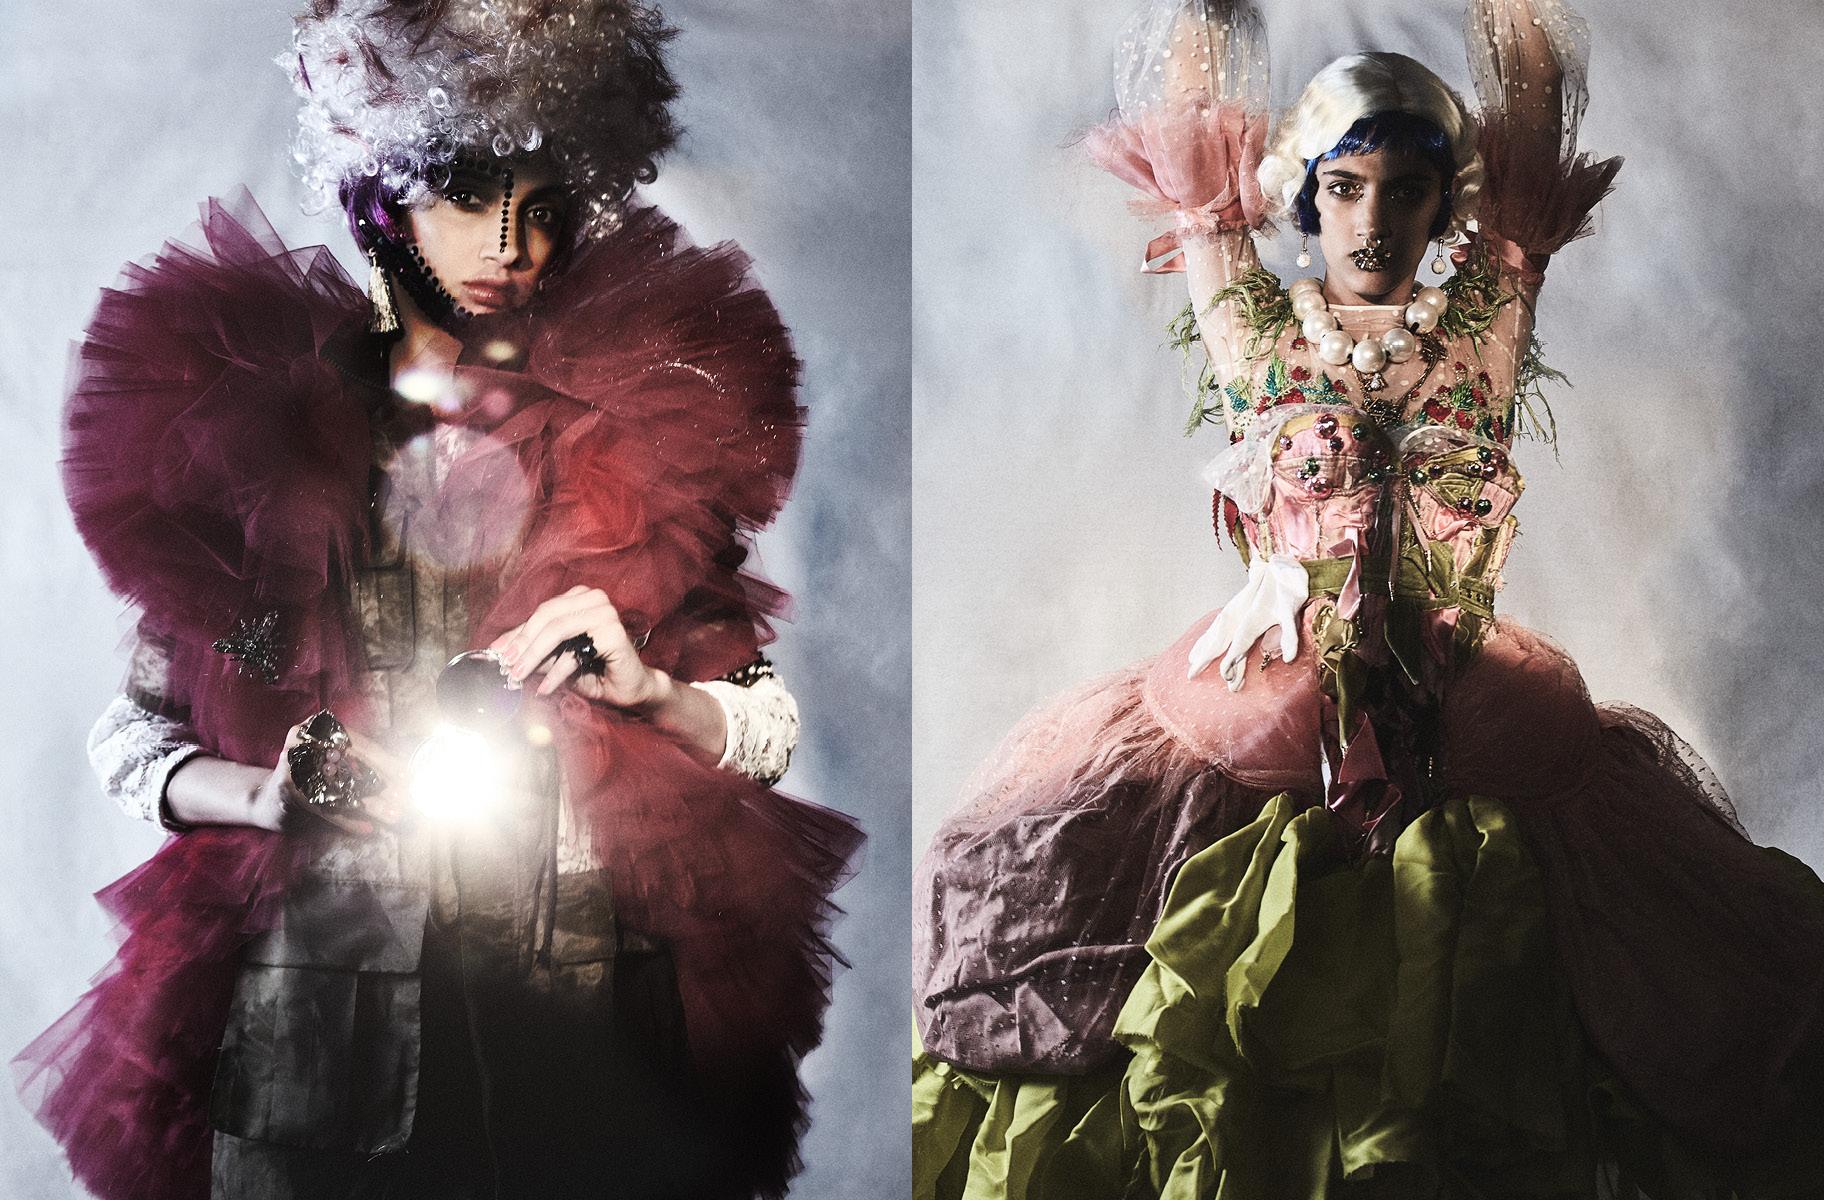 Spirit-&-Flesh-Magazine_THE-UNBEARABLE-BRIGHTNESS-OF-BEING_by_Evan-Lee_5